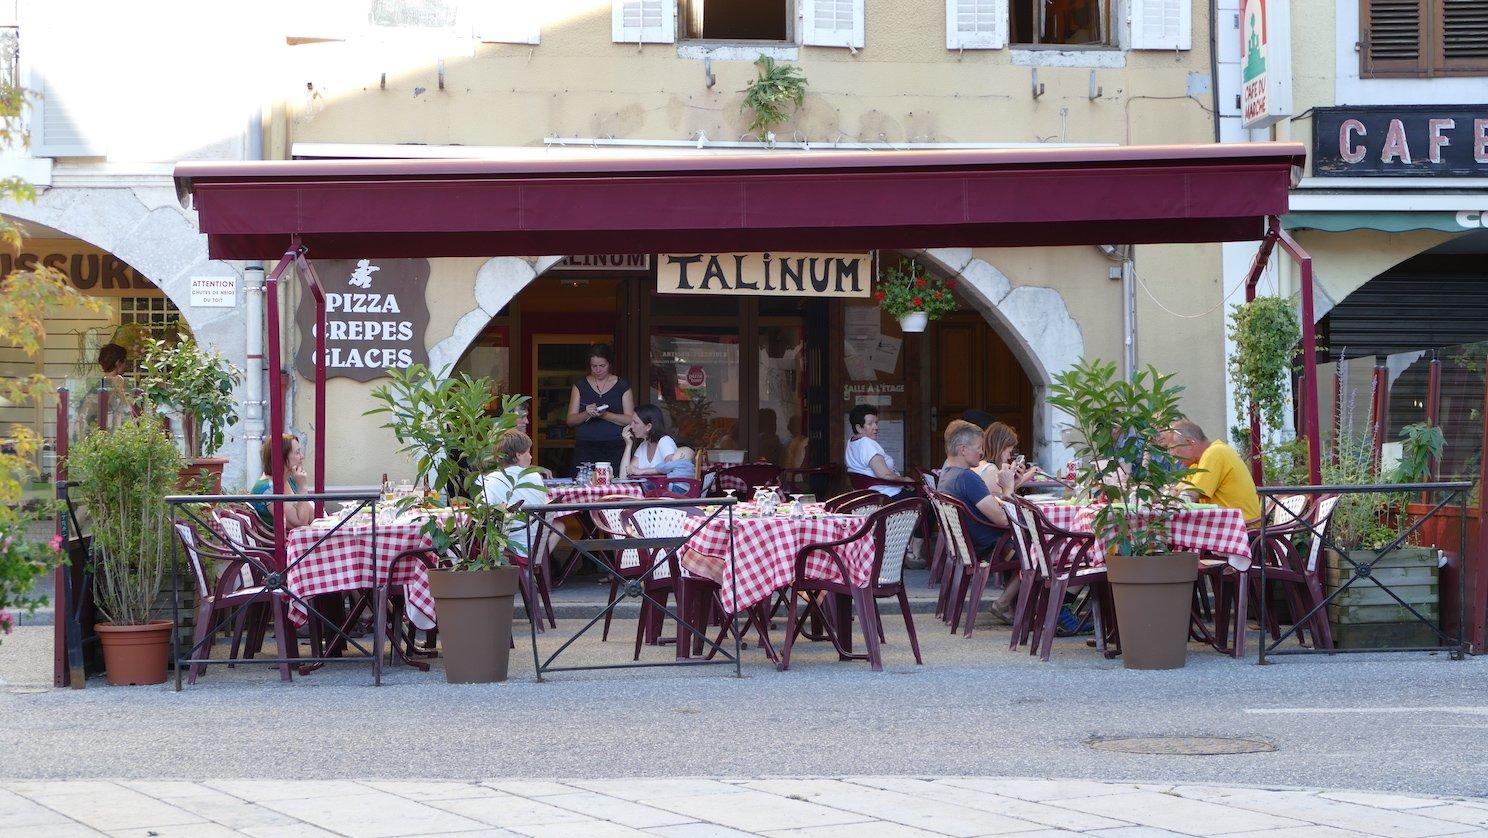 France Food Guide: 10 Pizza food Must-Eat Restaurants & Street Food Stalls in Manigod